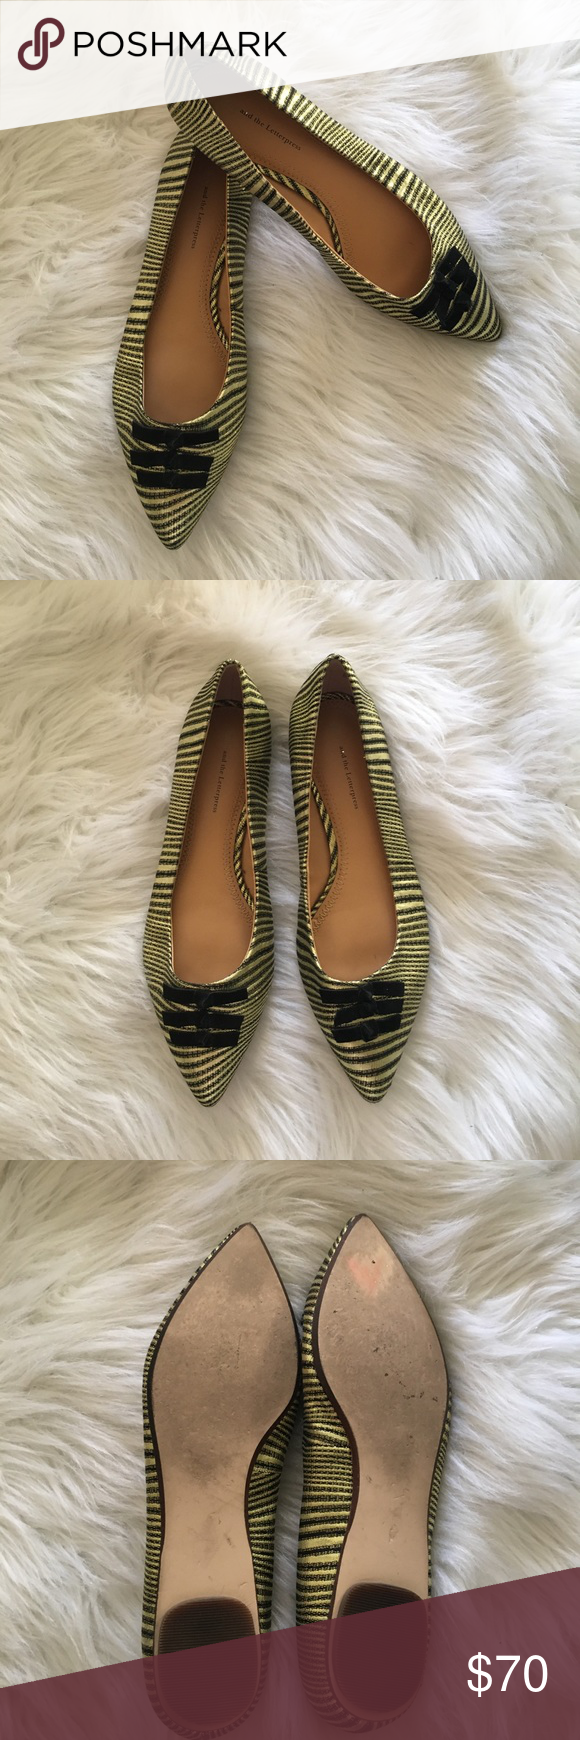 Anthropologie Shoes | Anthropologie Vicenza Paris Velvet